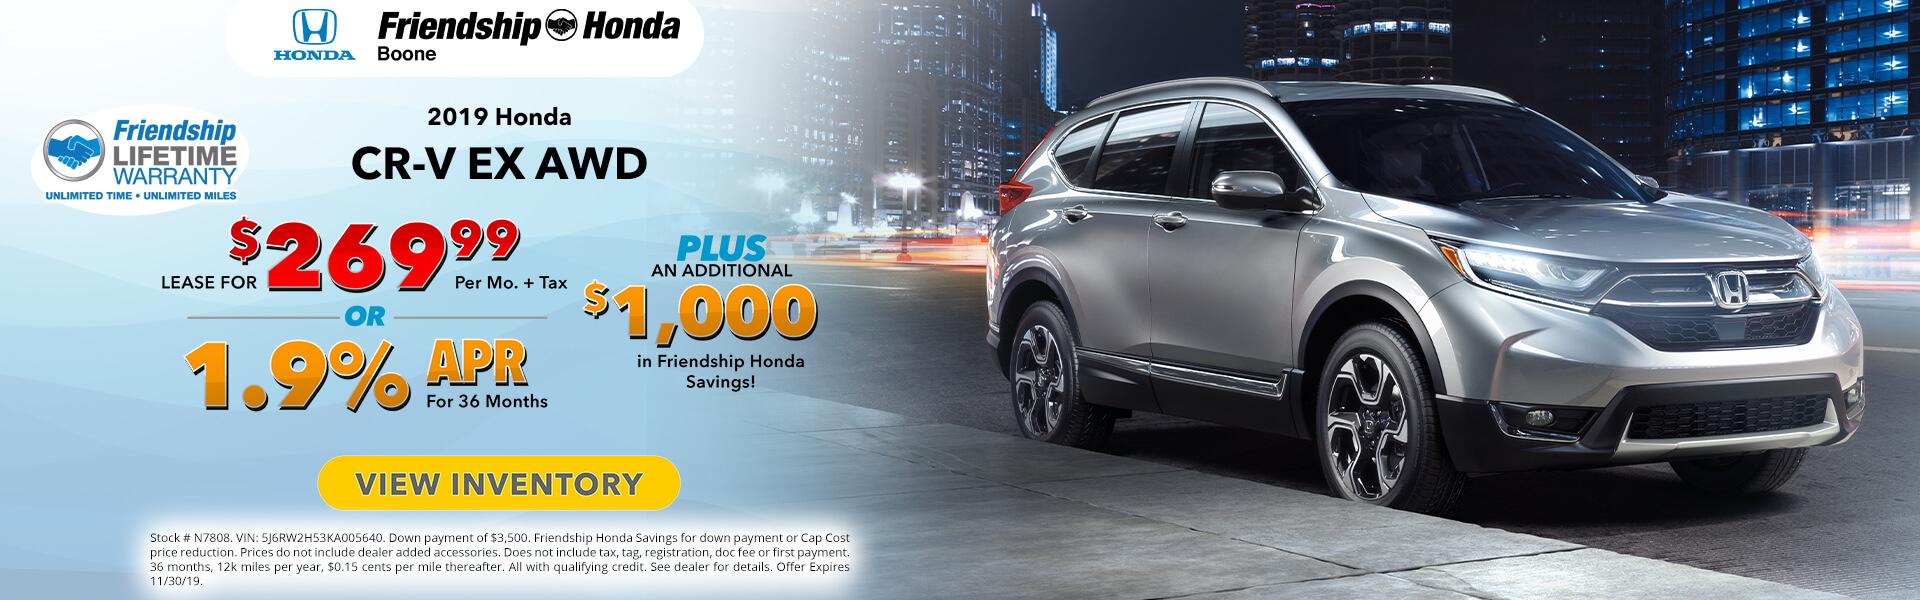 Honda CR- V EX $269.99 Lease